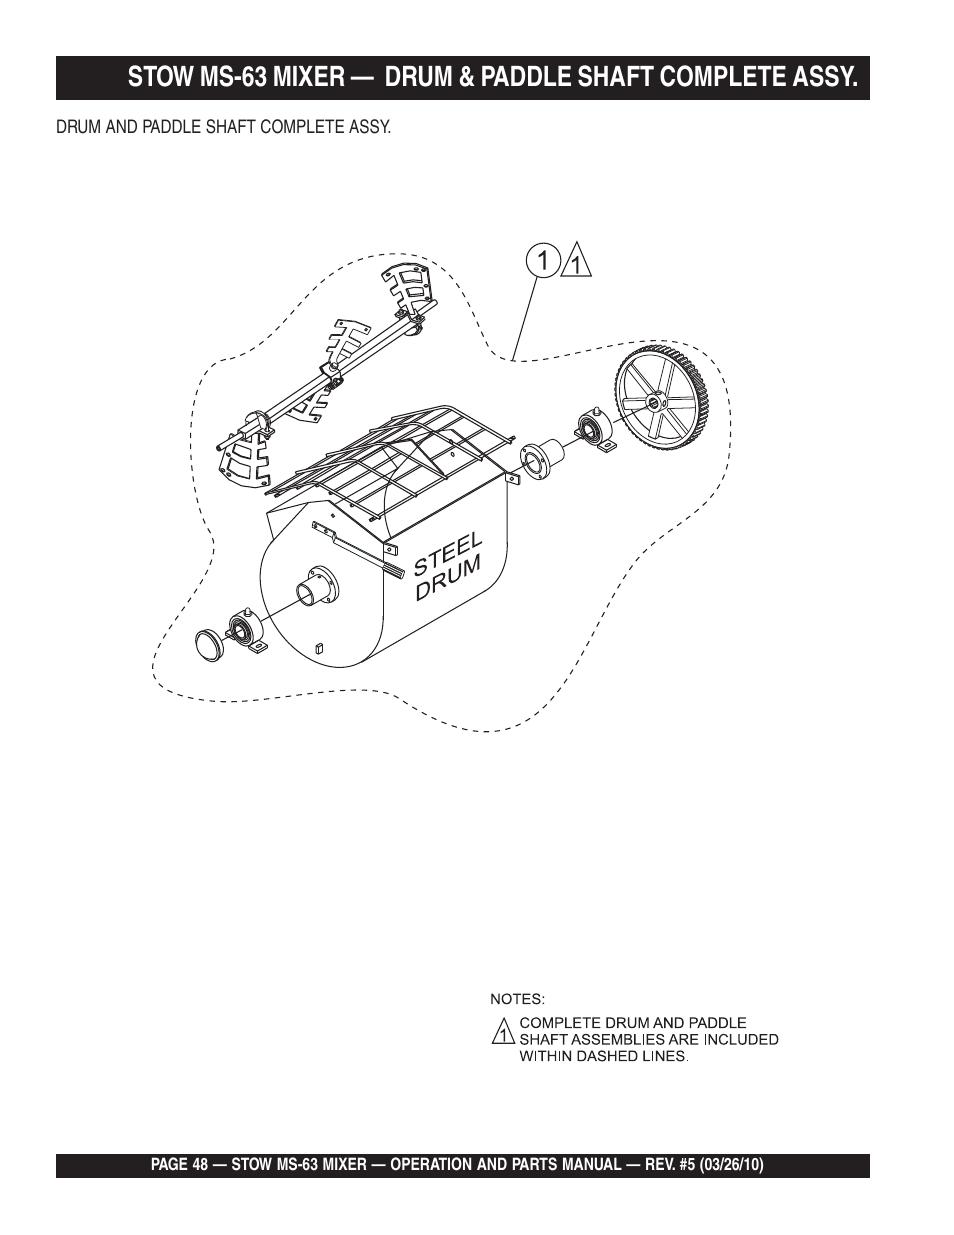 Stow Mixer Drum Parts Diagram - Car Wiring Diagrams Explained •